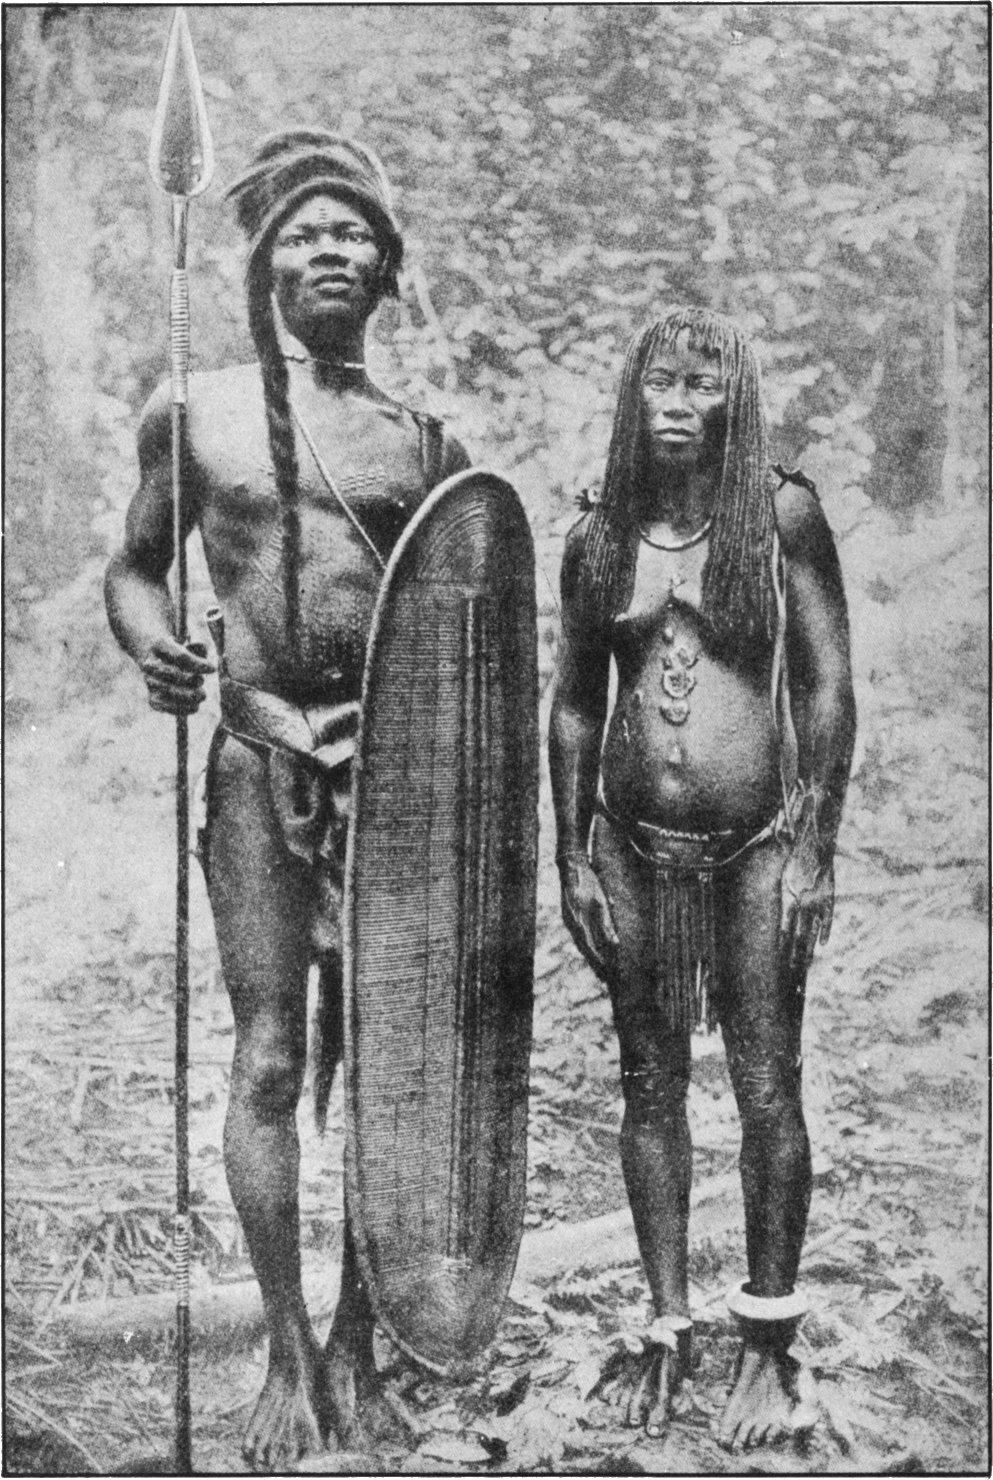 Nude tribesmen fucks photo